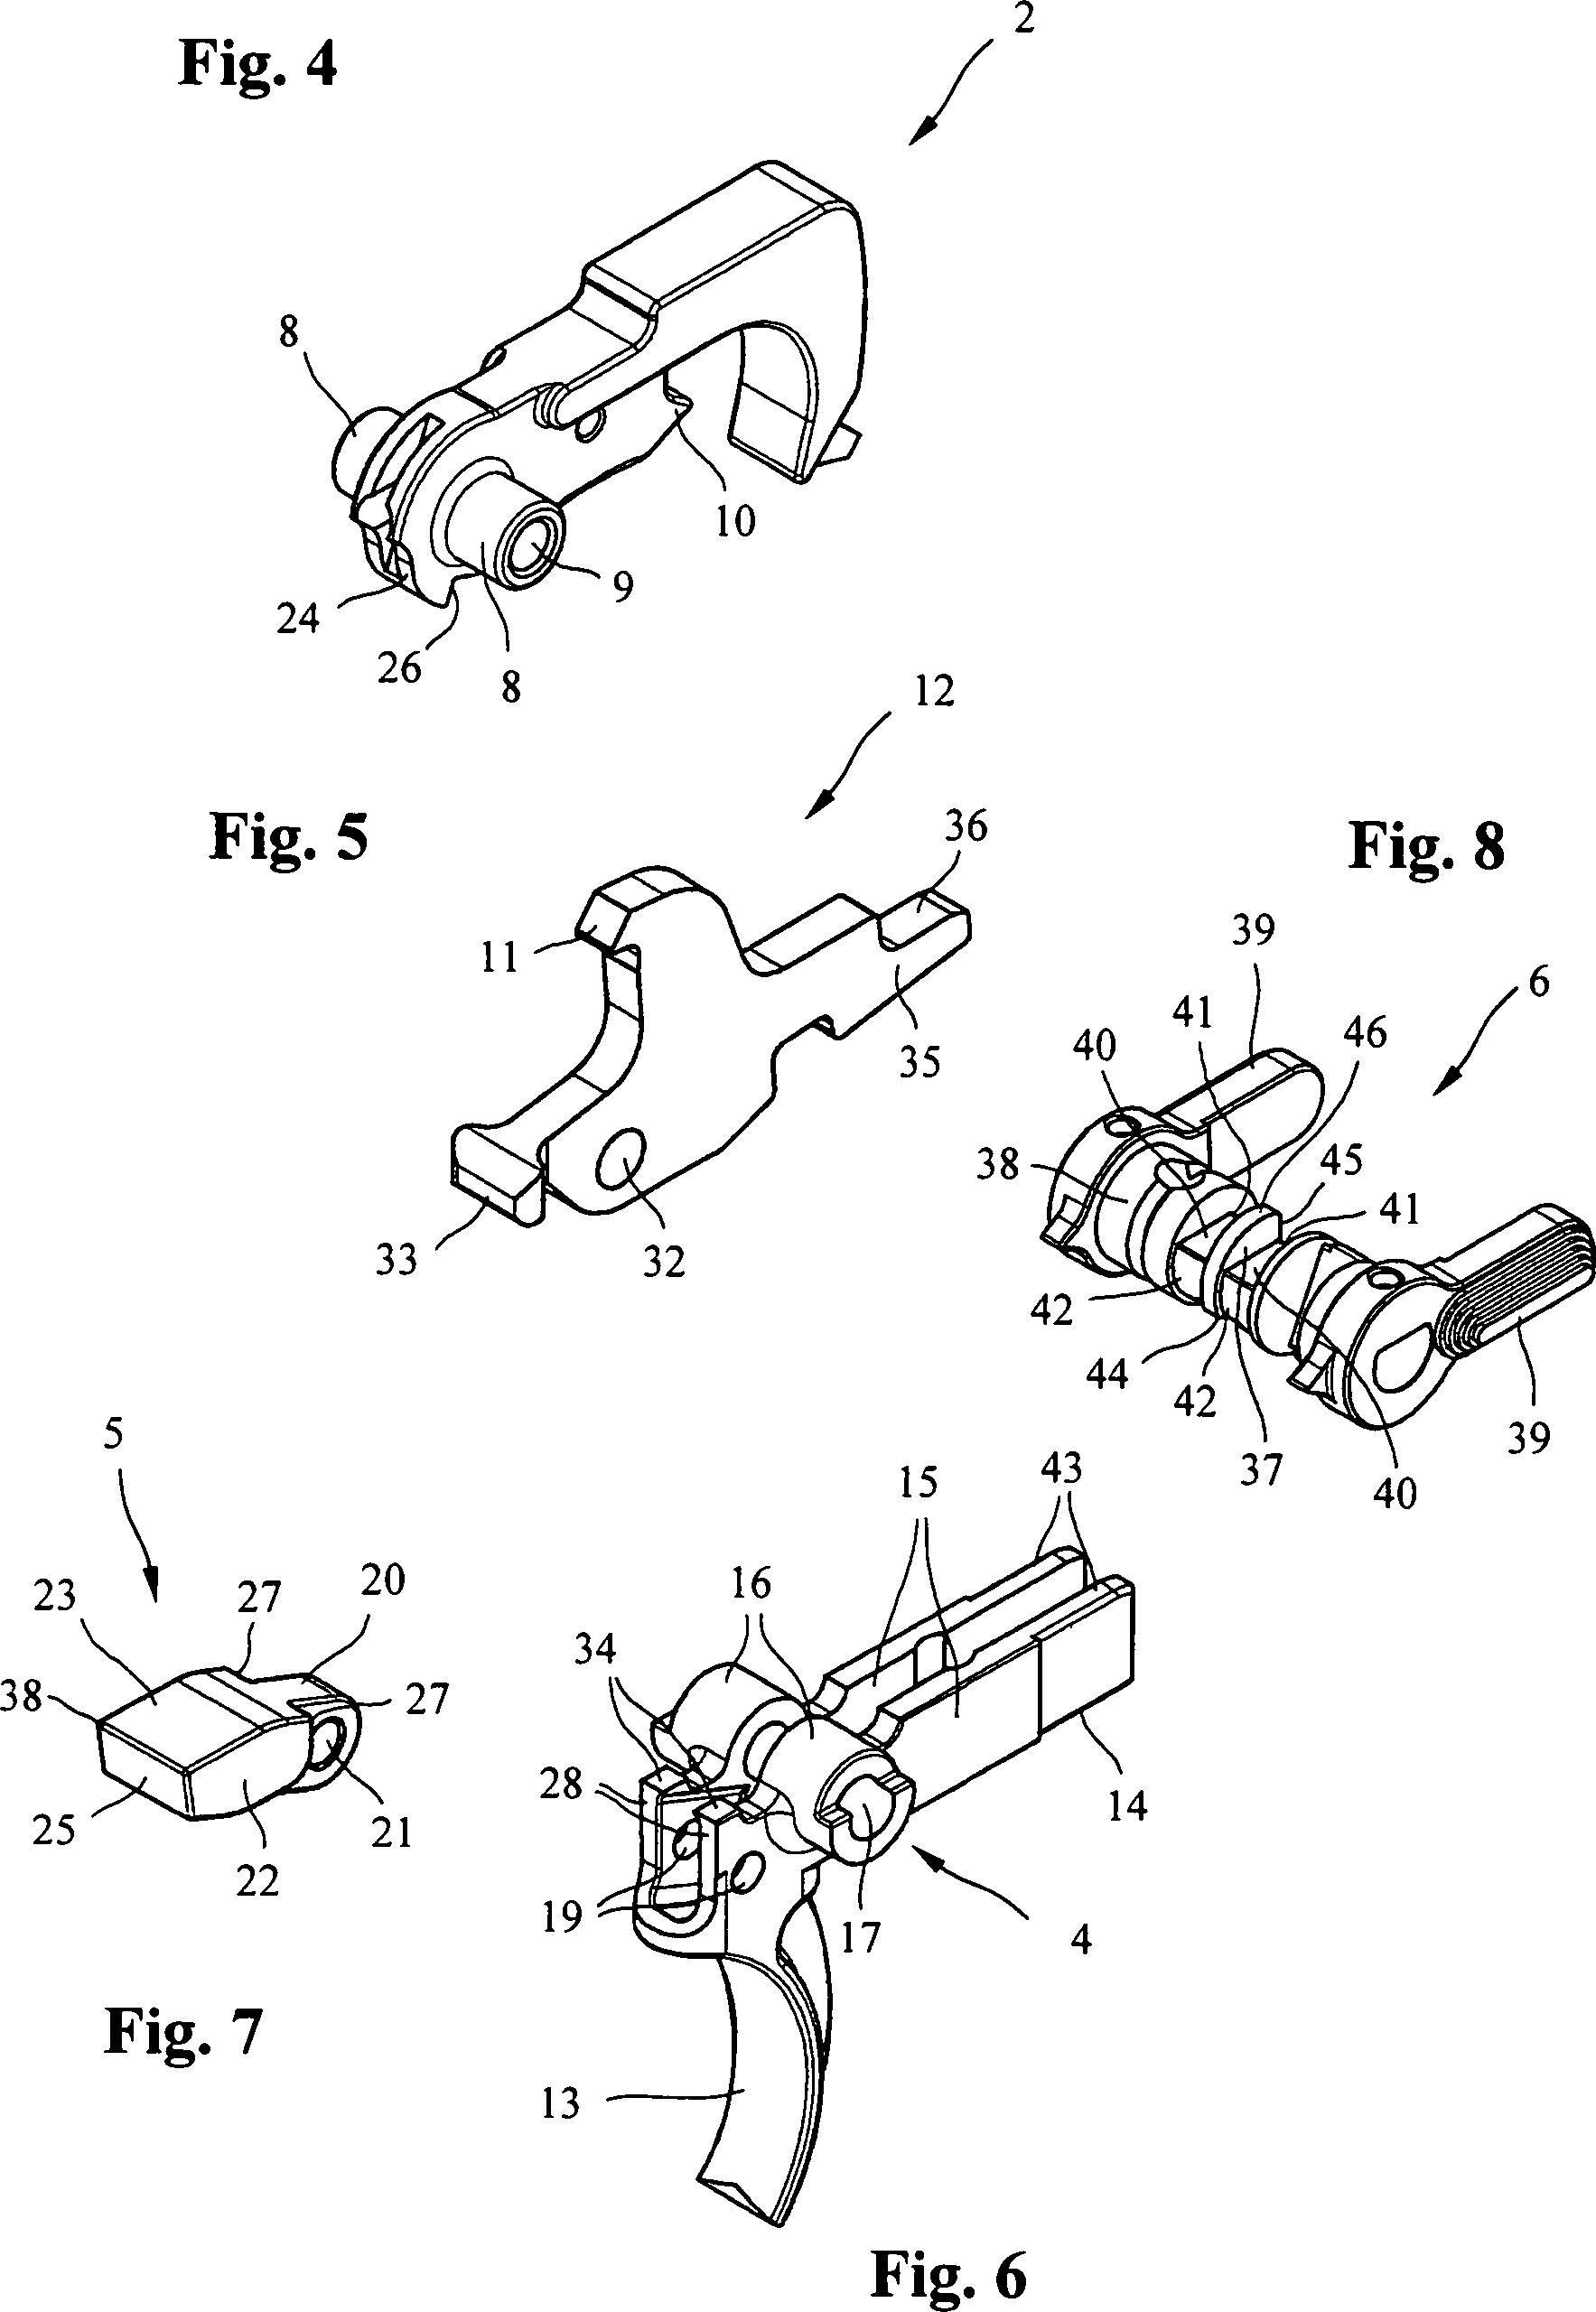 medium resolution of de202011004556u1 trigger mechanism for a handgun google patents